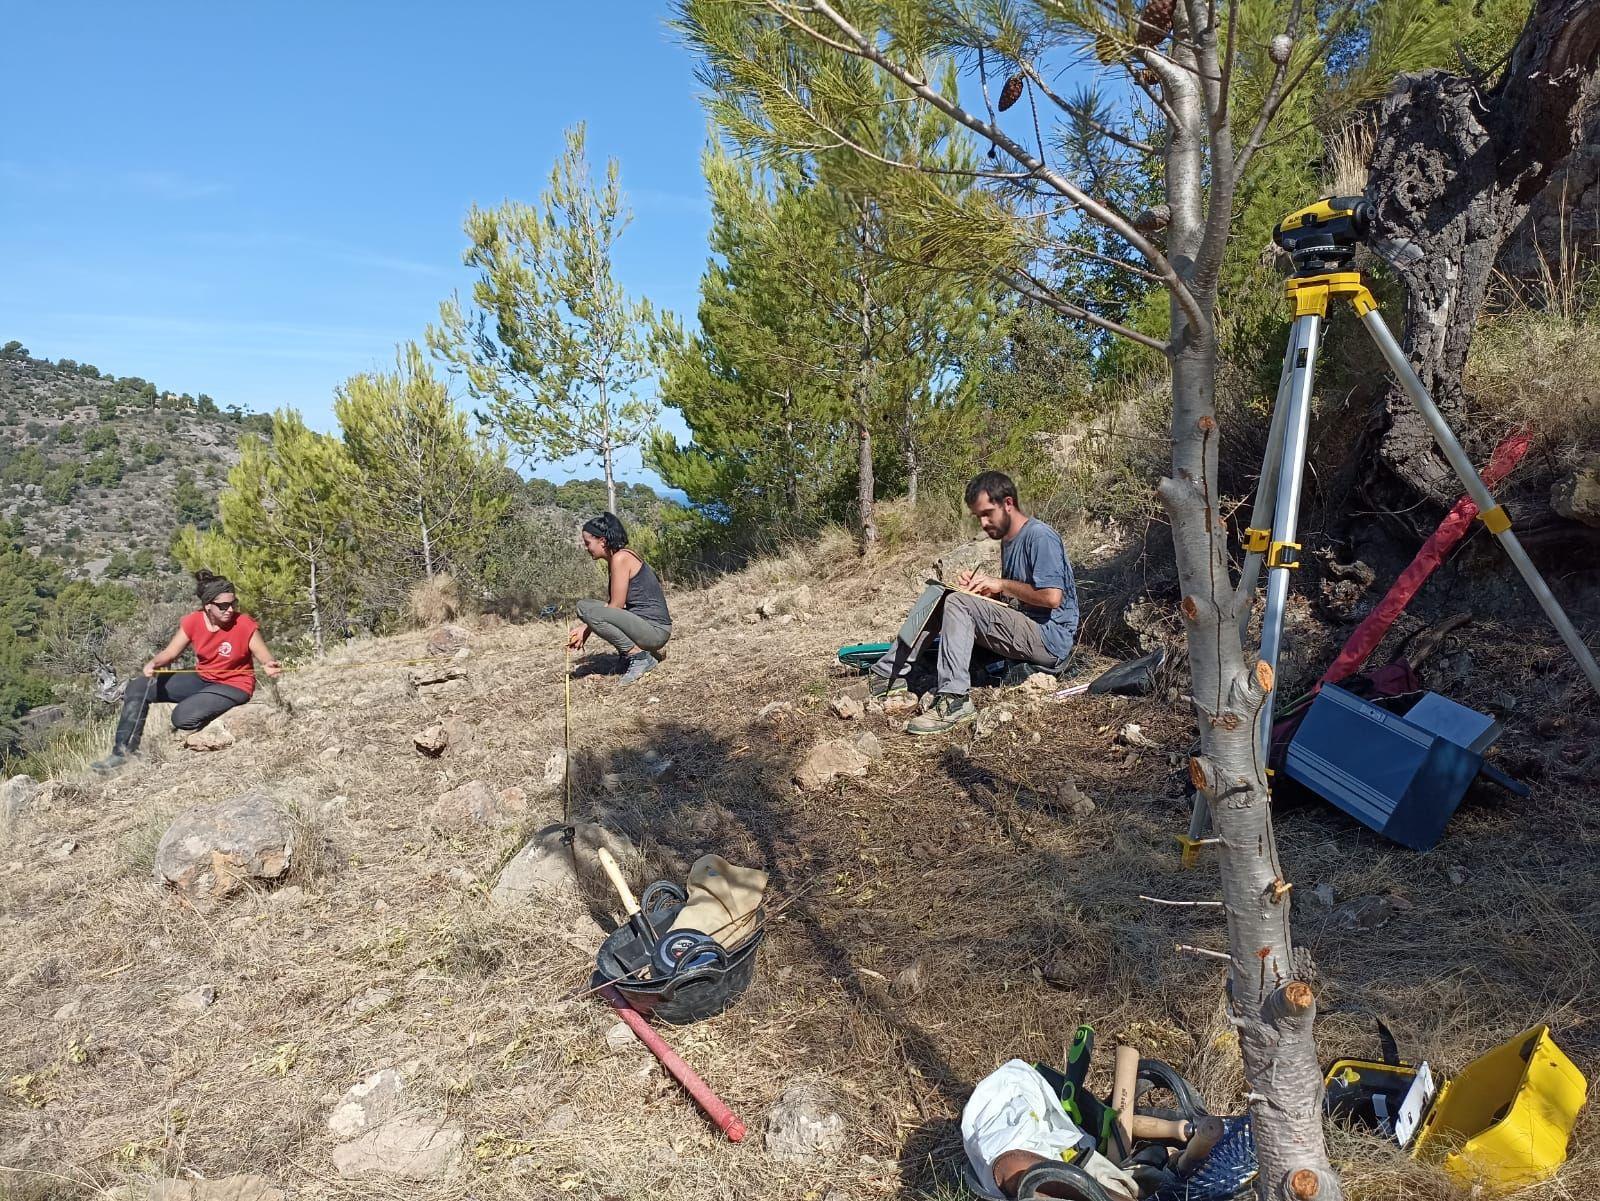 Descubren un yacimiento inédito de época romana en plena Serra de Tramuntana